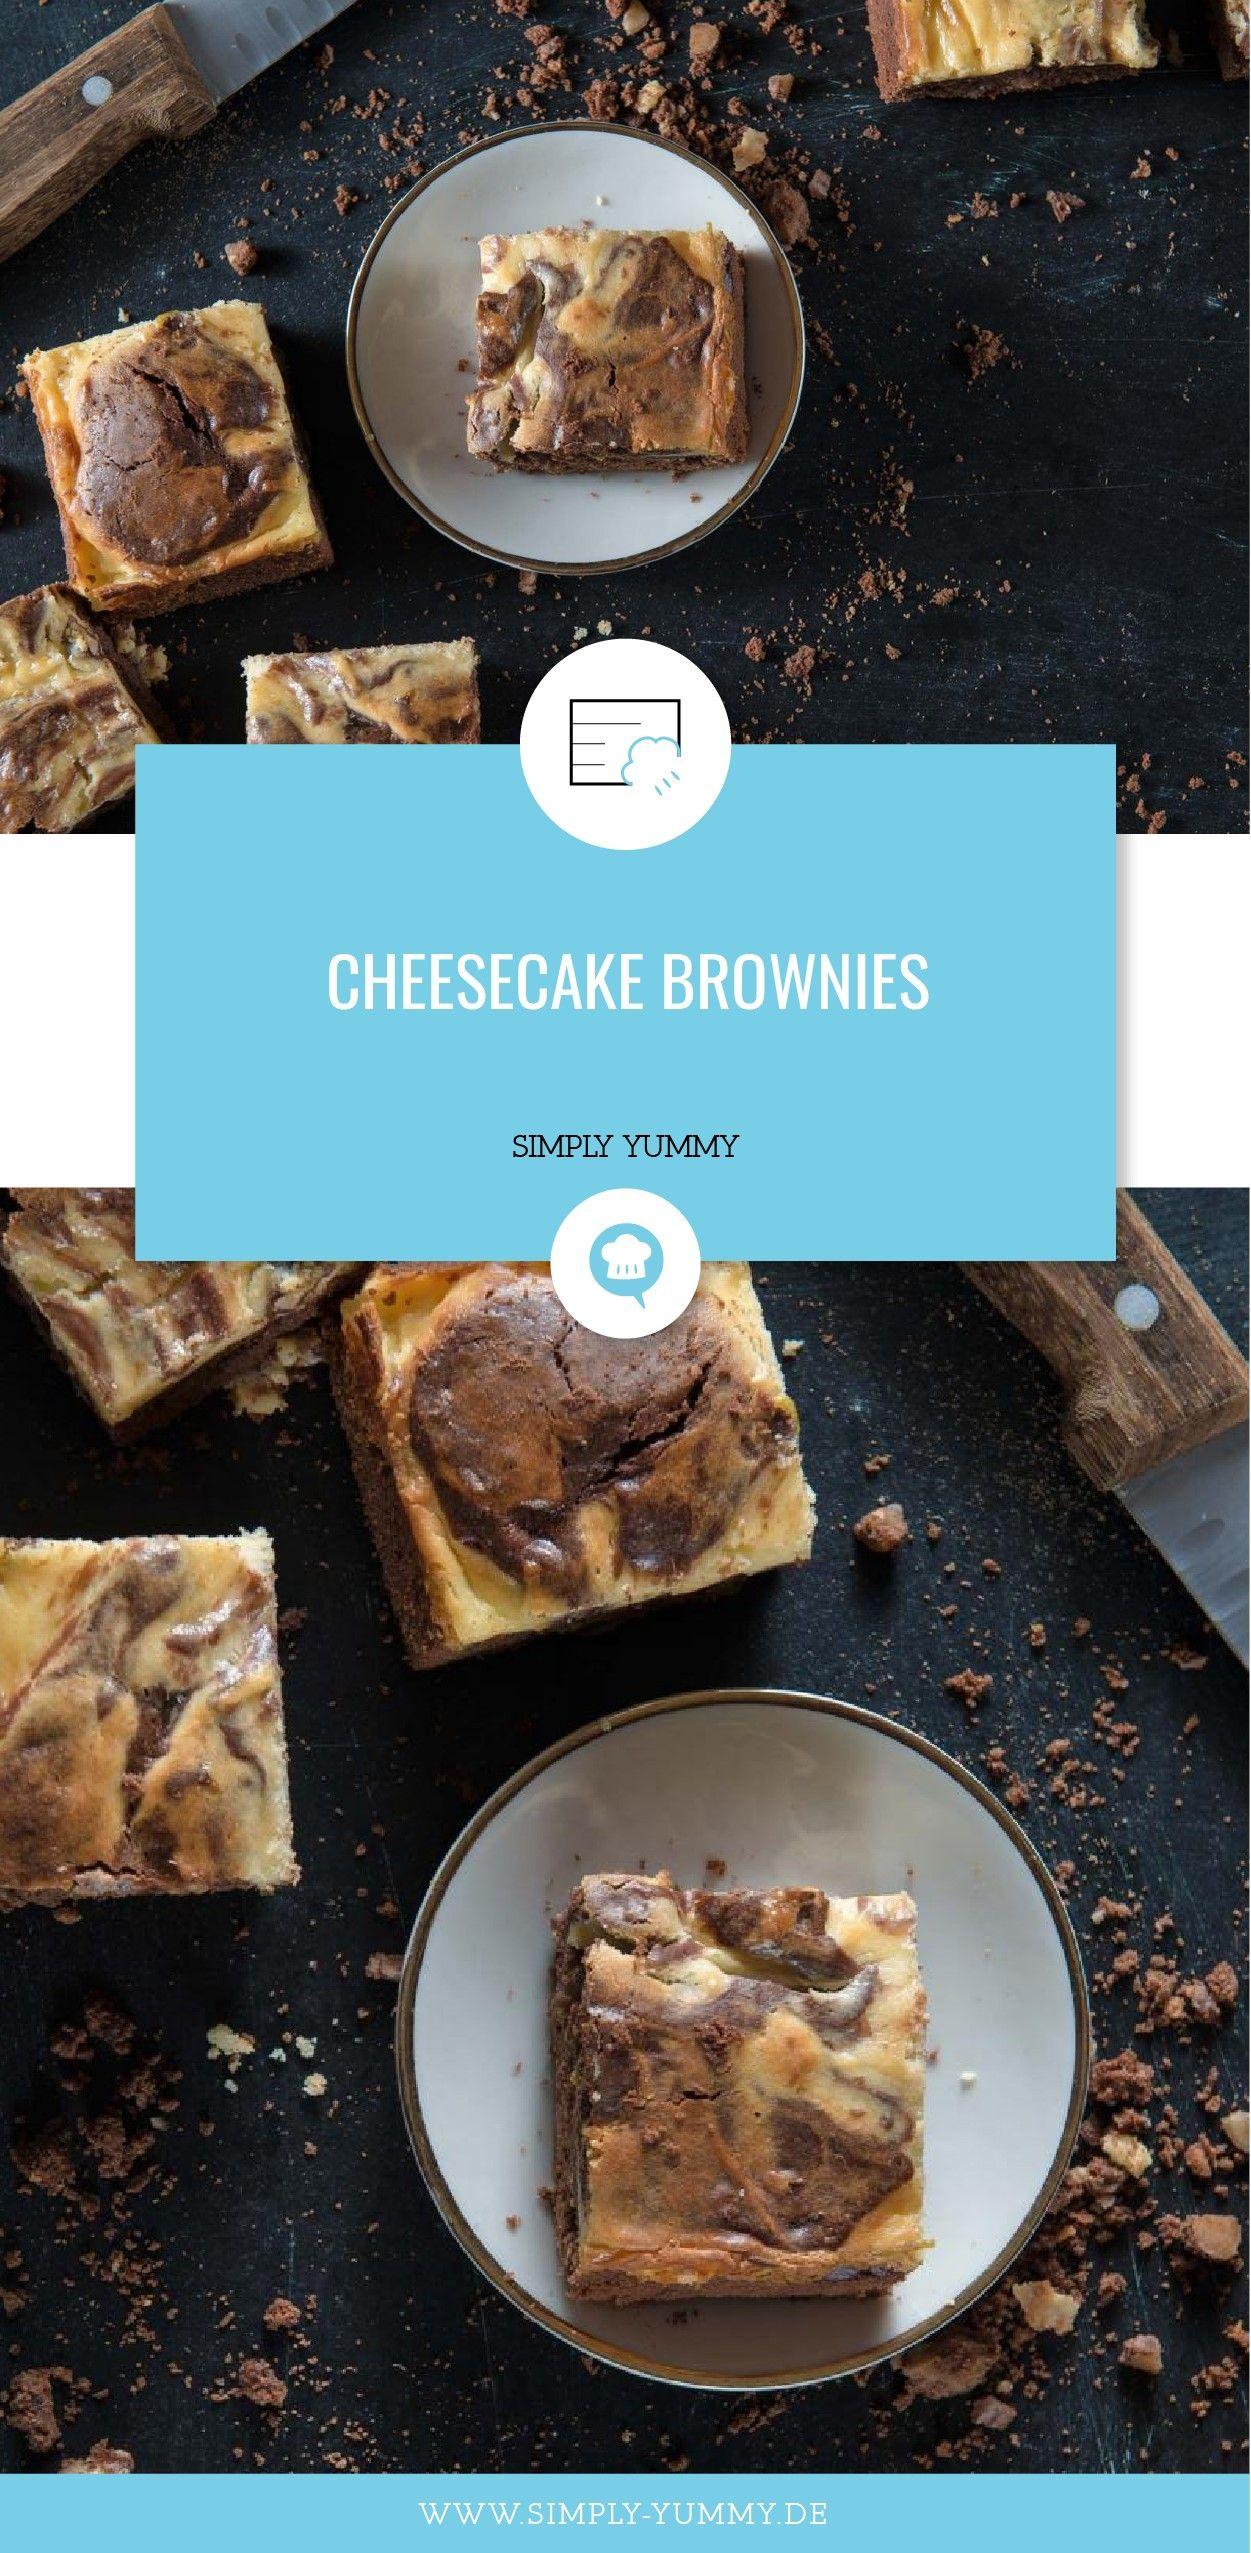 Cheesecake Brownies | Receta | Pinterest